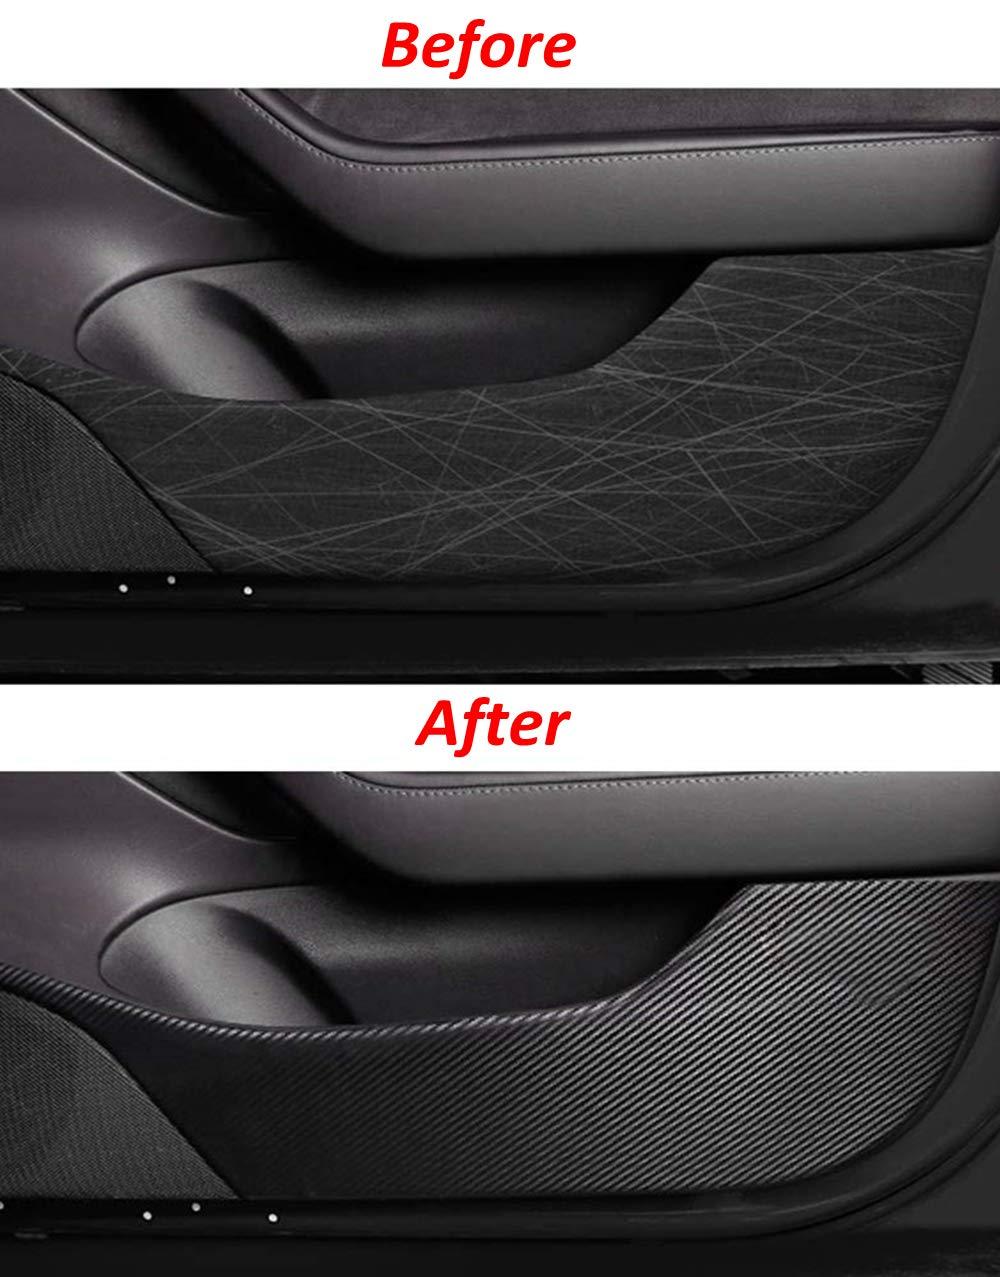 Upgrade Version Magicalmai Tesla Model 3 Door Anti-Kick Vinyl Wrap Sticker Door Edge Guard Protector Carbon Fiber 4PCS//Set